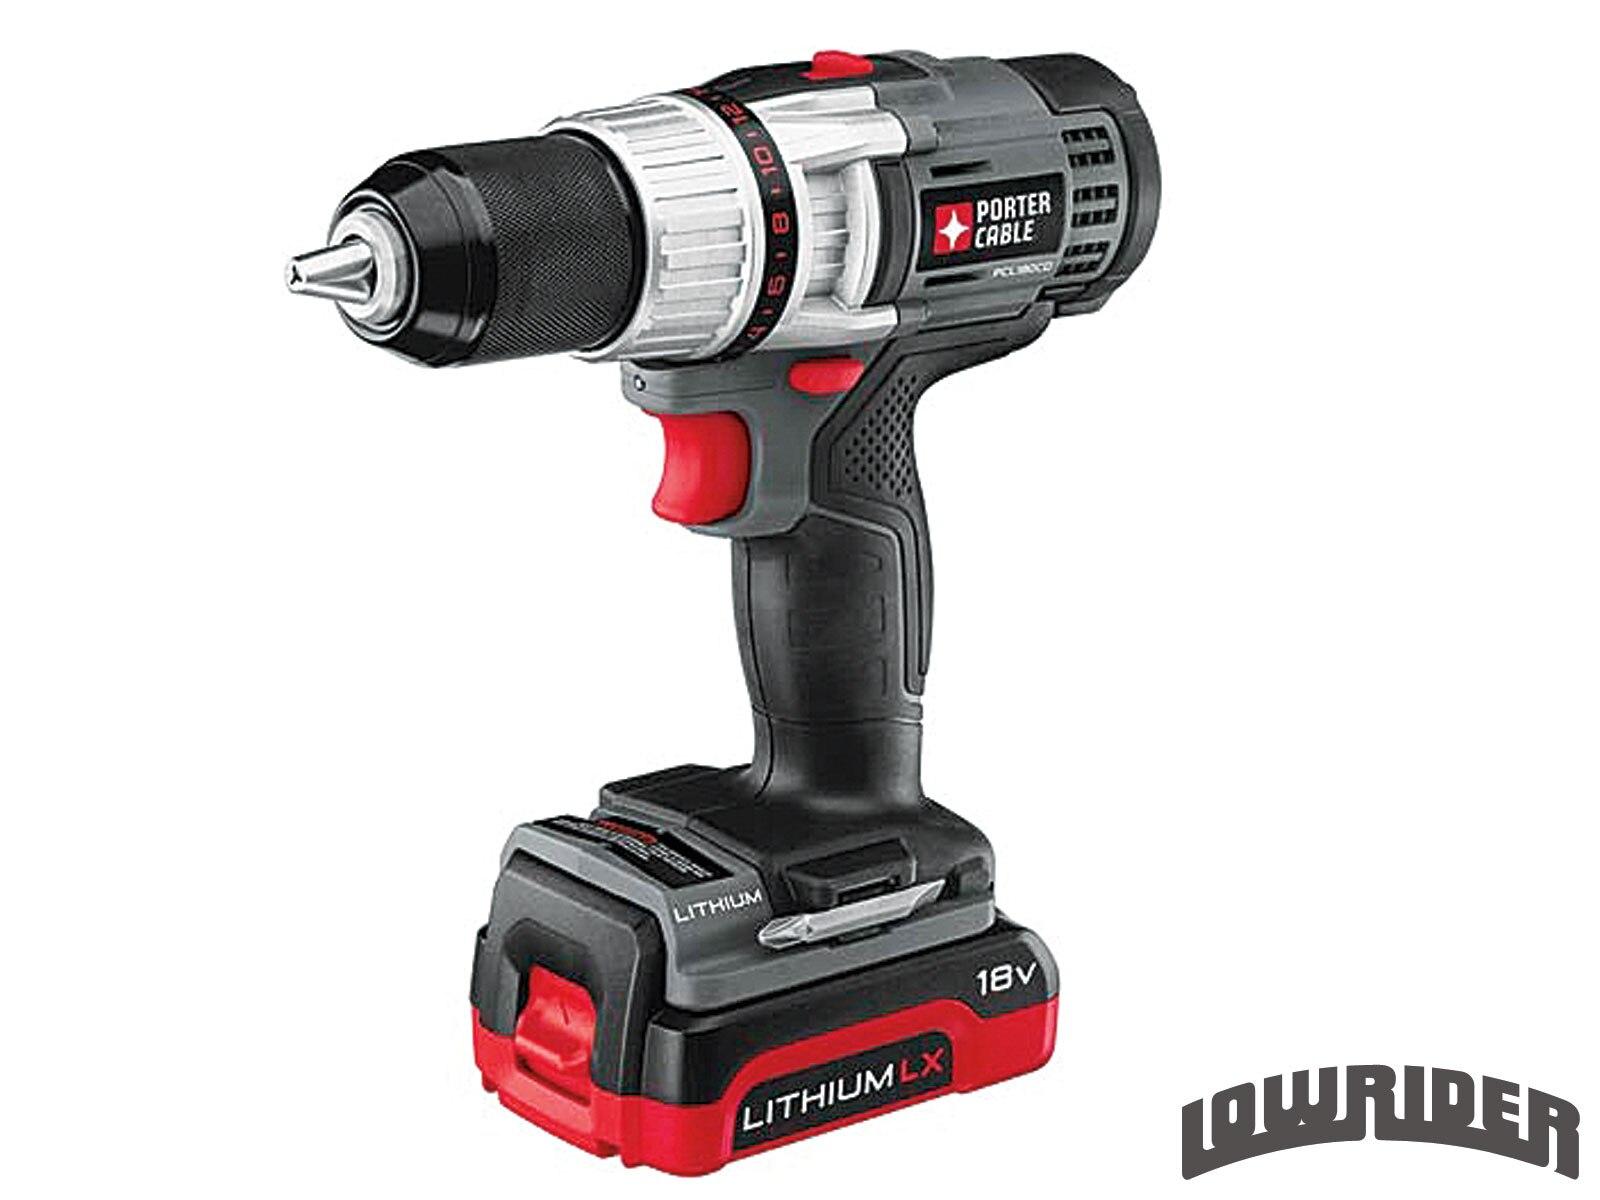 1205-lrmp-01-o-lowrider-parts-and-accessories-porter-cable-close-quarters-drill1